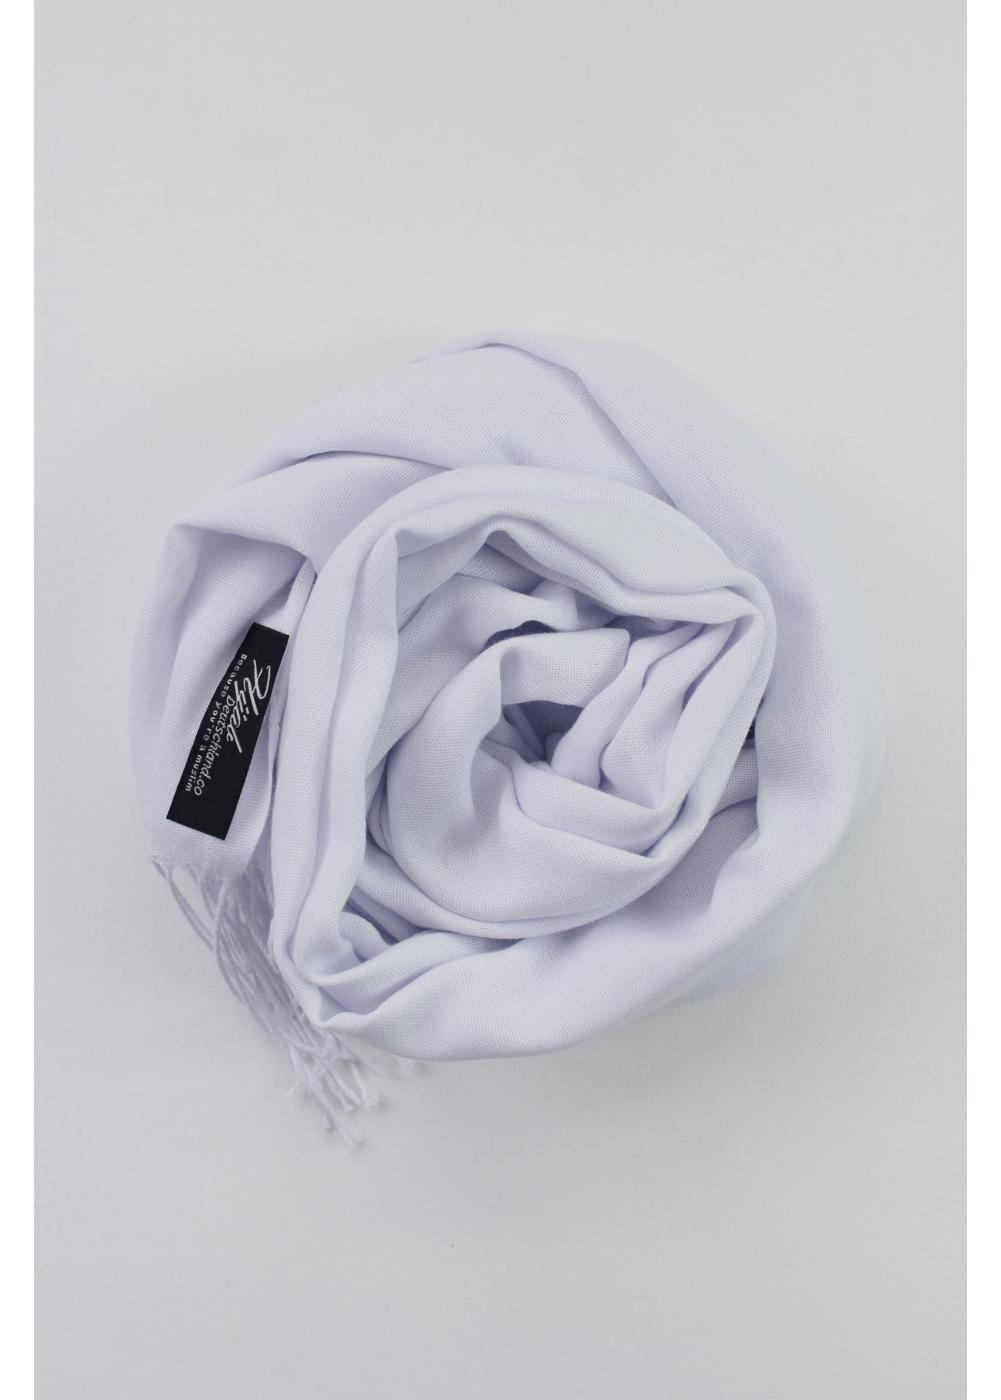 Pashmina hijab white